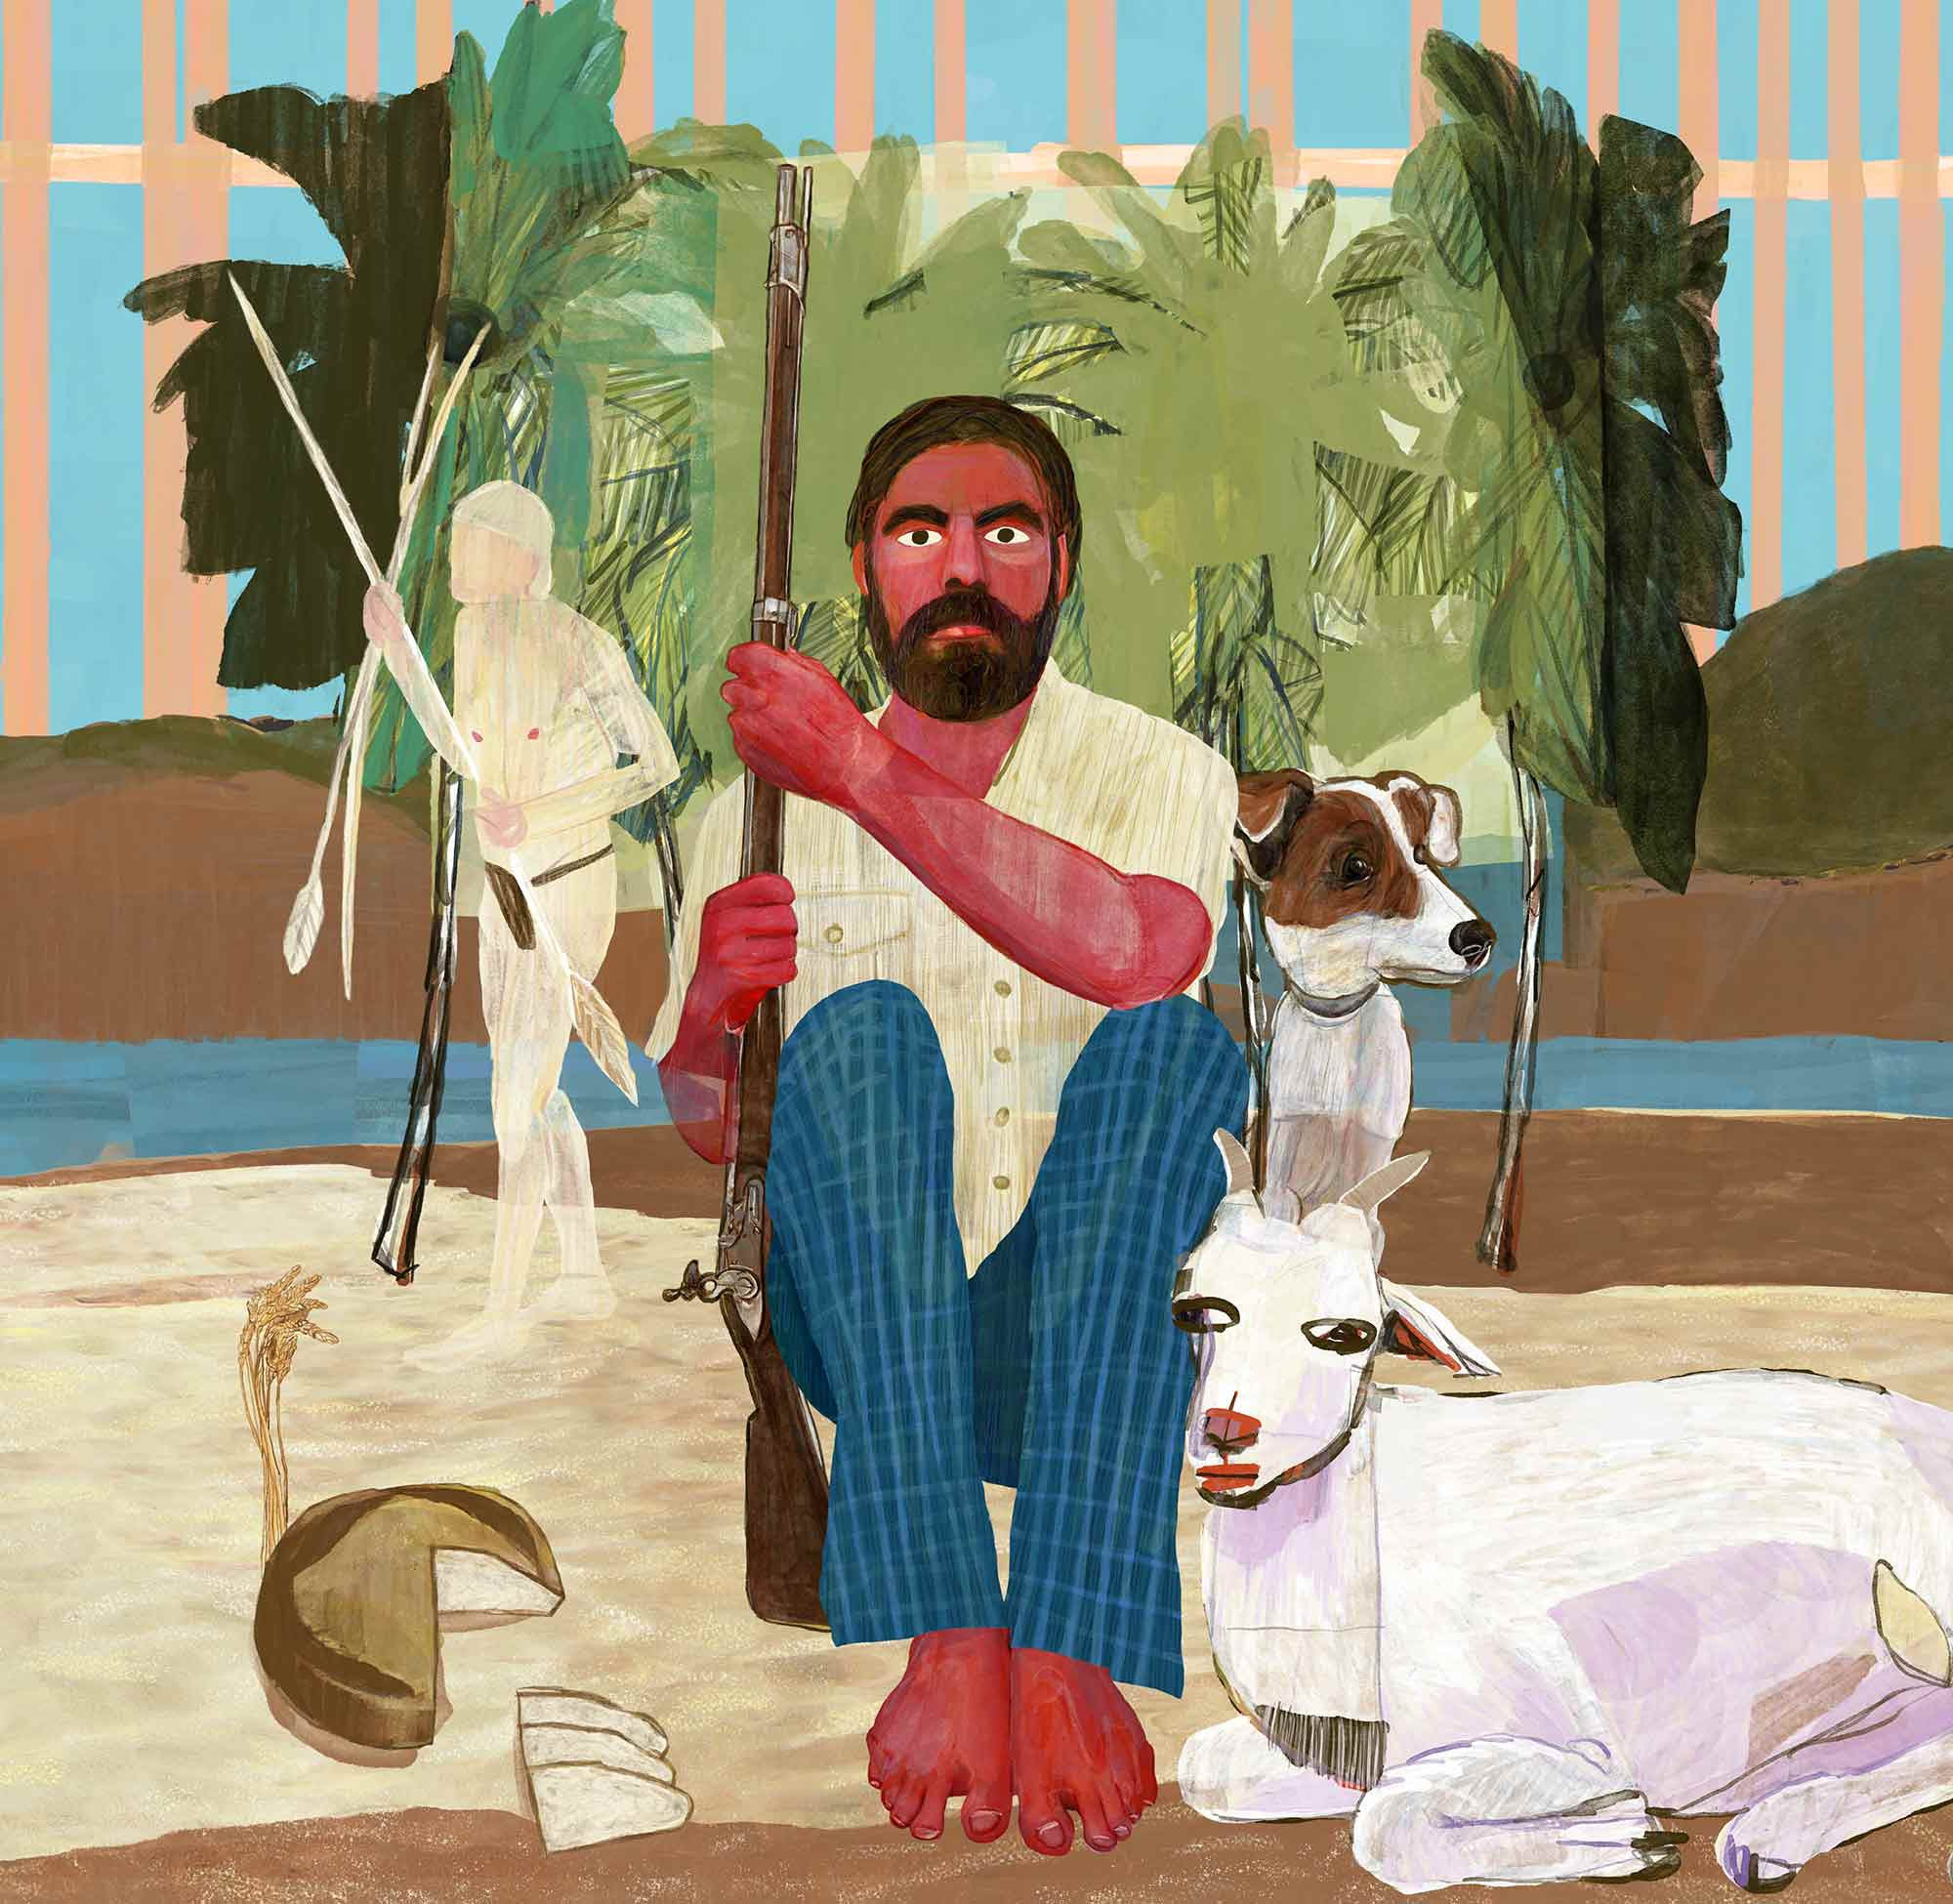 Robinson Crusoe by Daniel Defoe. Mario Jodra illustration